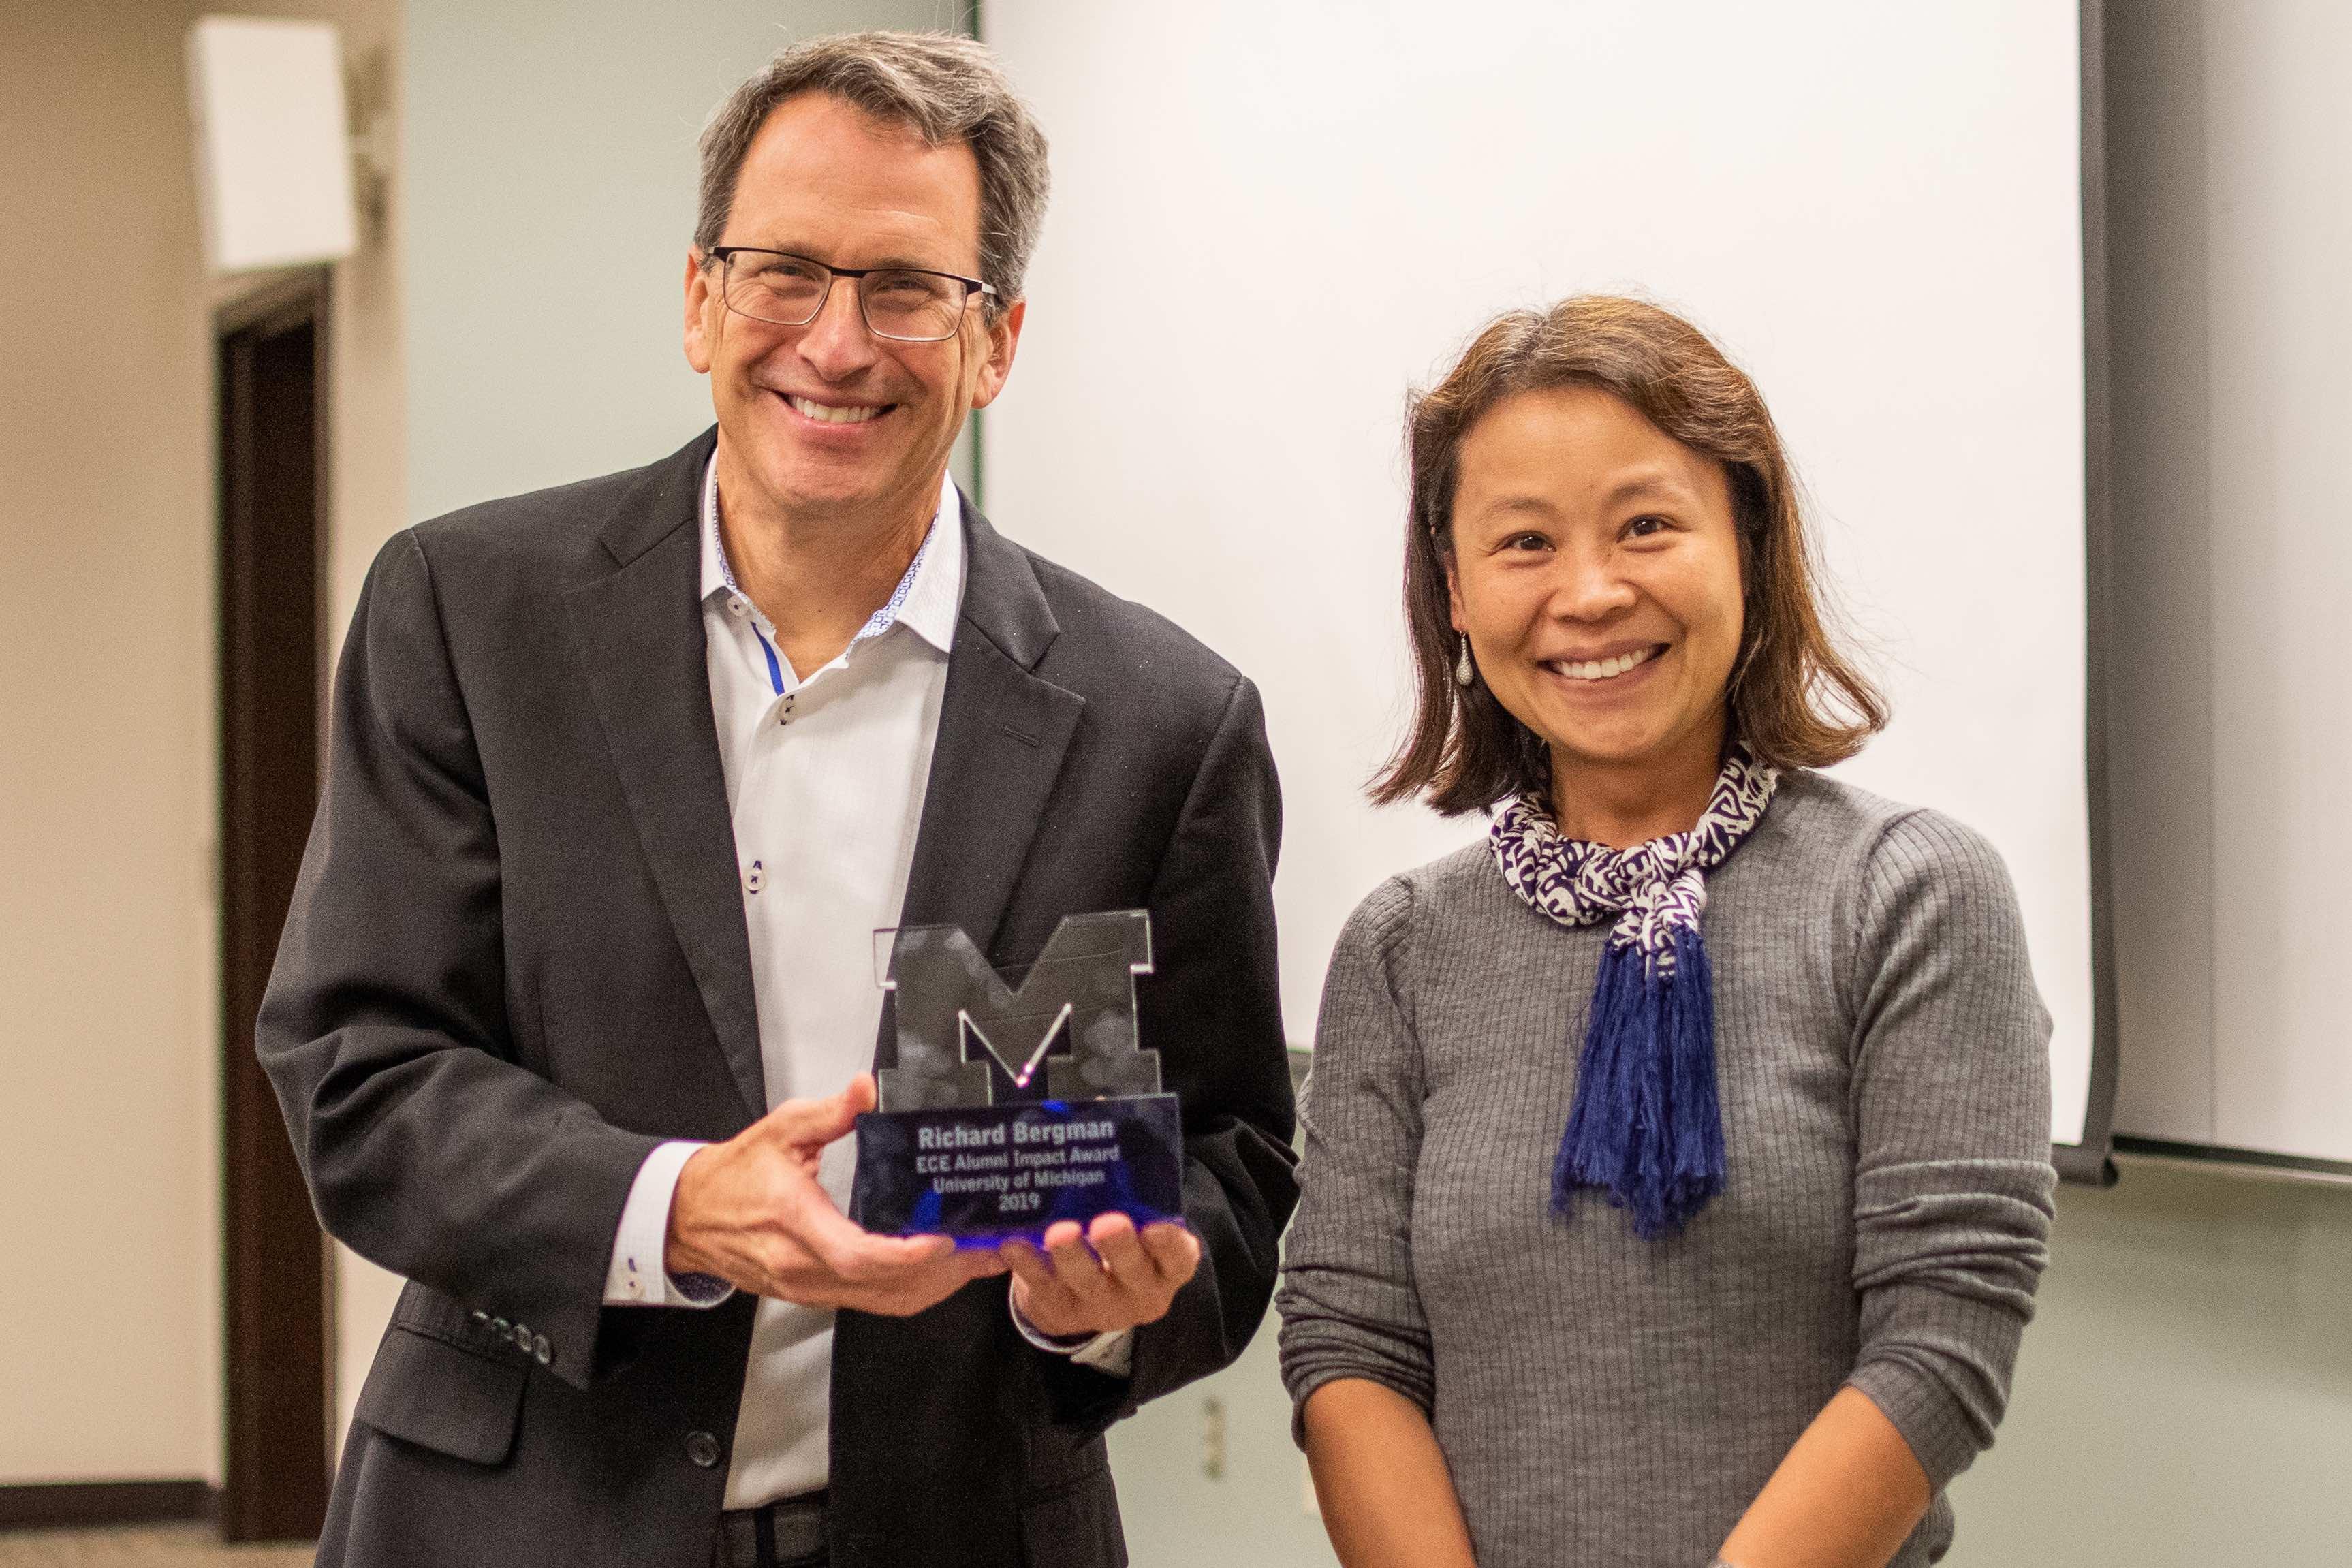 Rick Bergman and Mingyan Liu